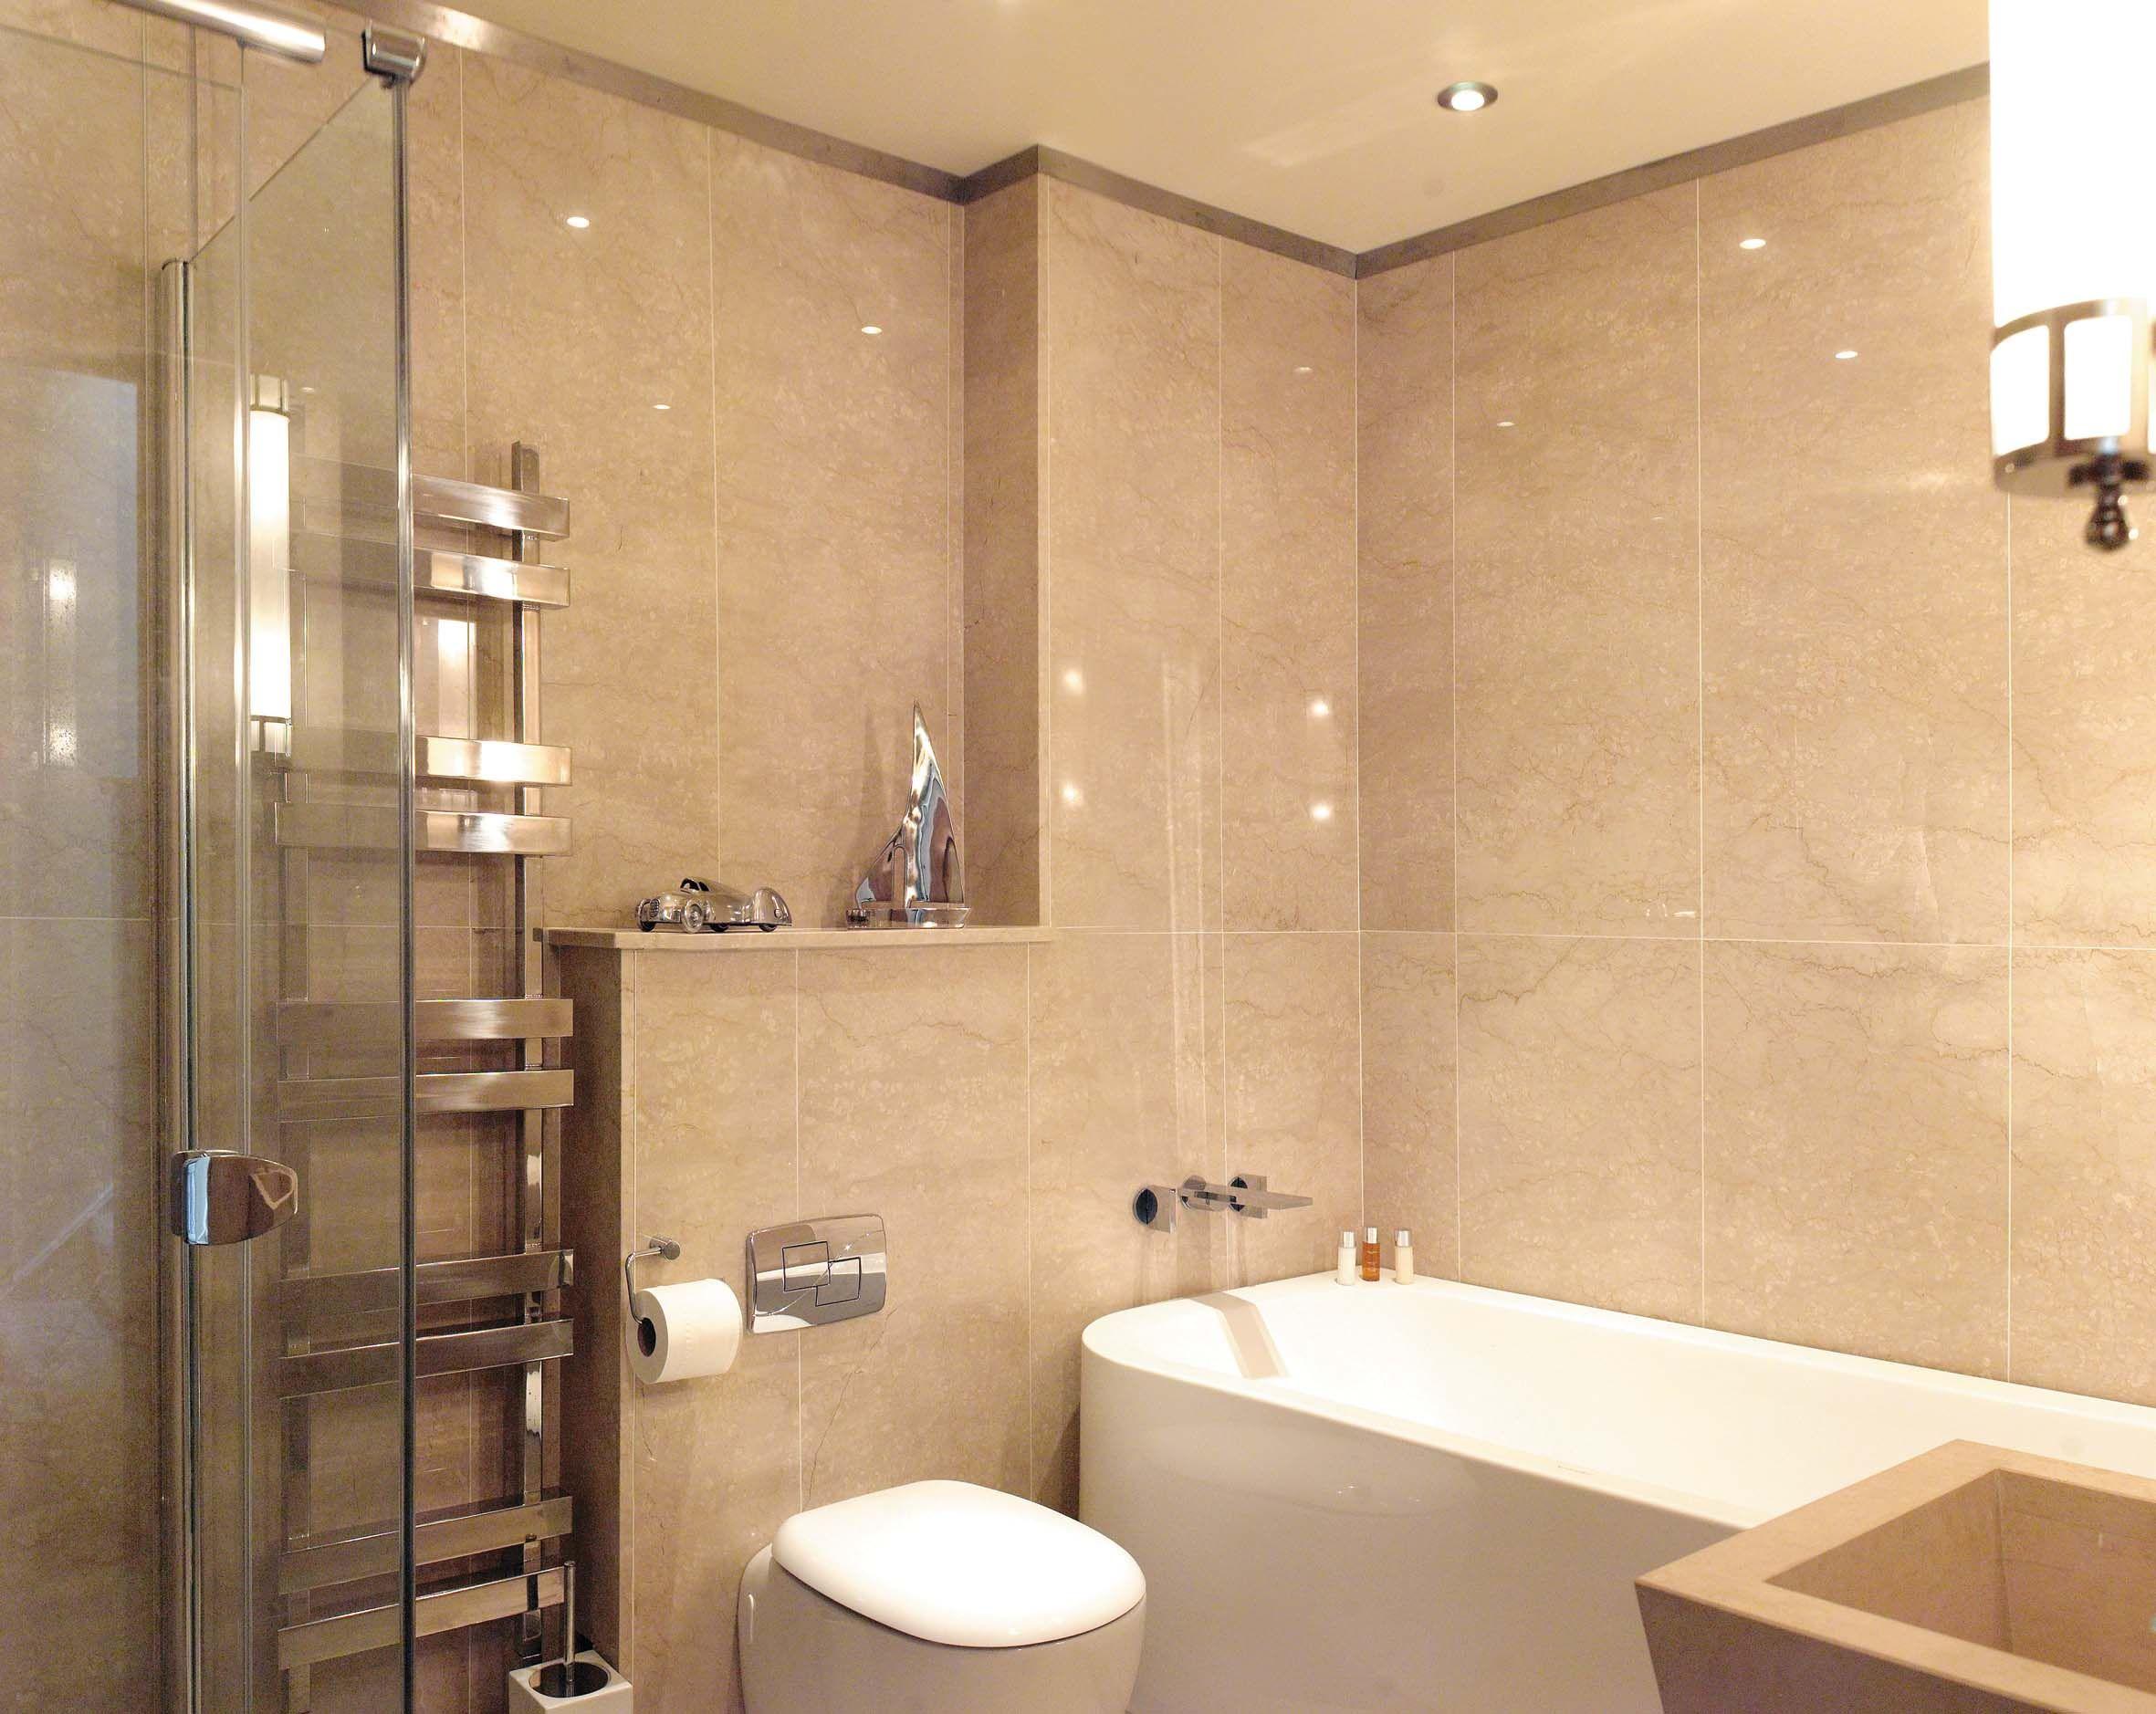 Guest Bathroom Floor And Wall Cladding In Crema Imperiale Polished Limestone Bathroom Marble Bathroom Wall Coverings Bathroom Wall Panels Gray Bathroom Decor